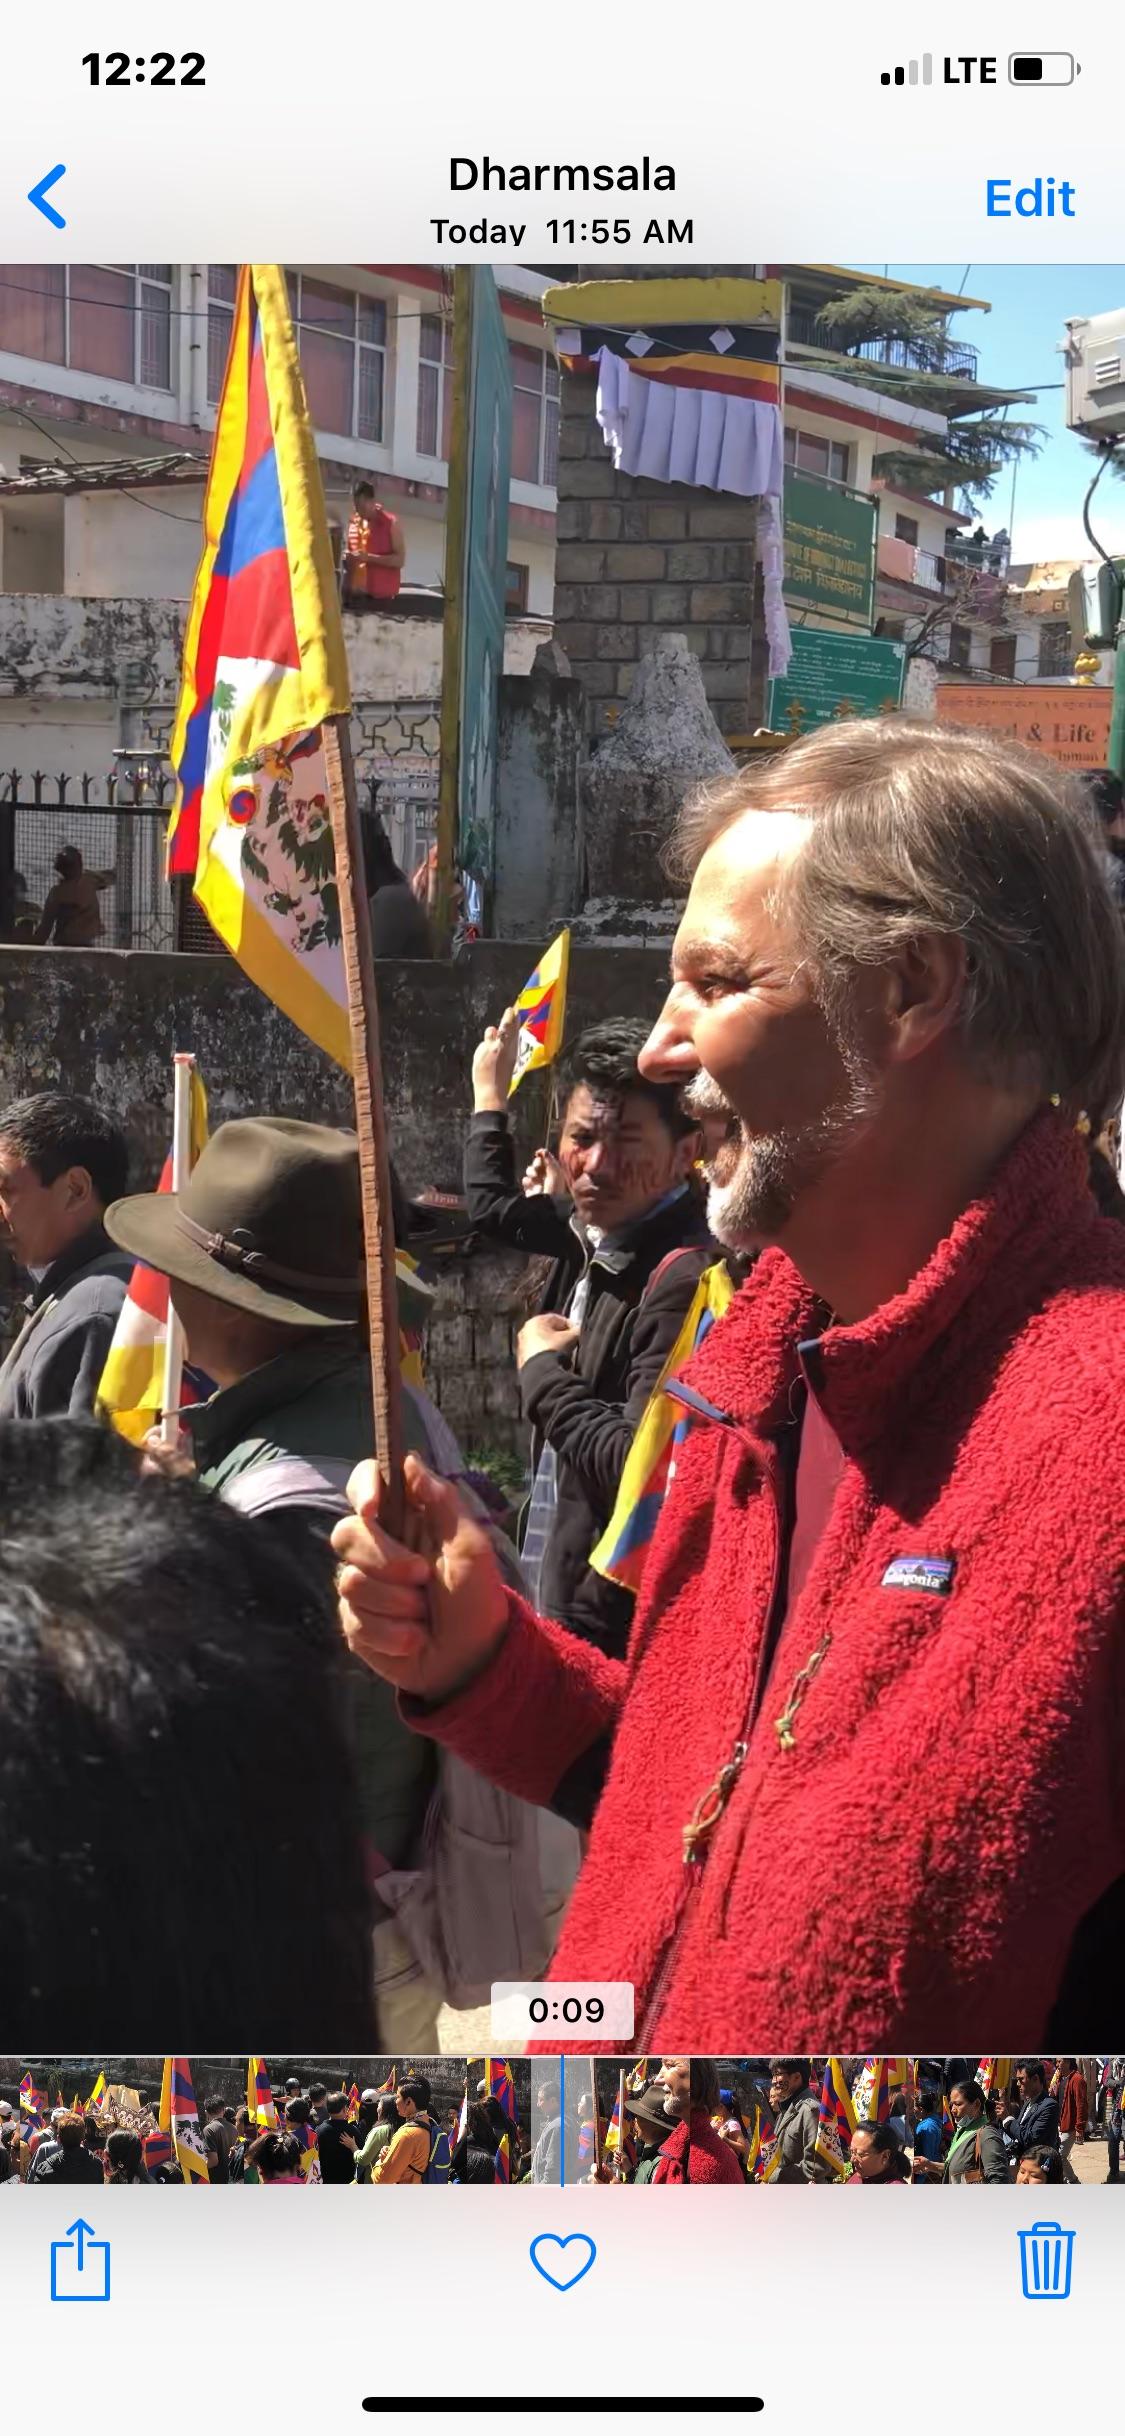 Photo of Bruce Pardoe in Dharamsala by Cindy Shaw.jpg